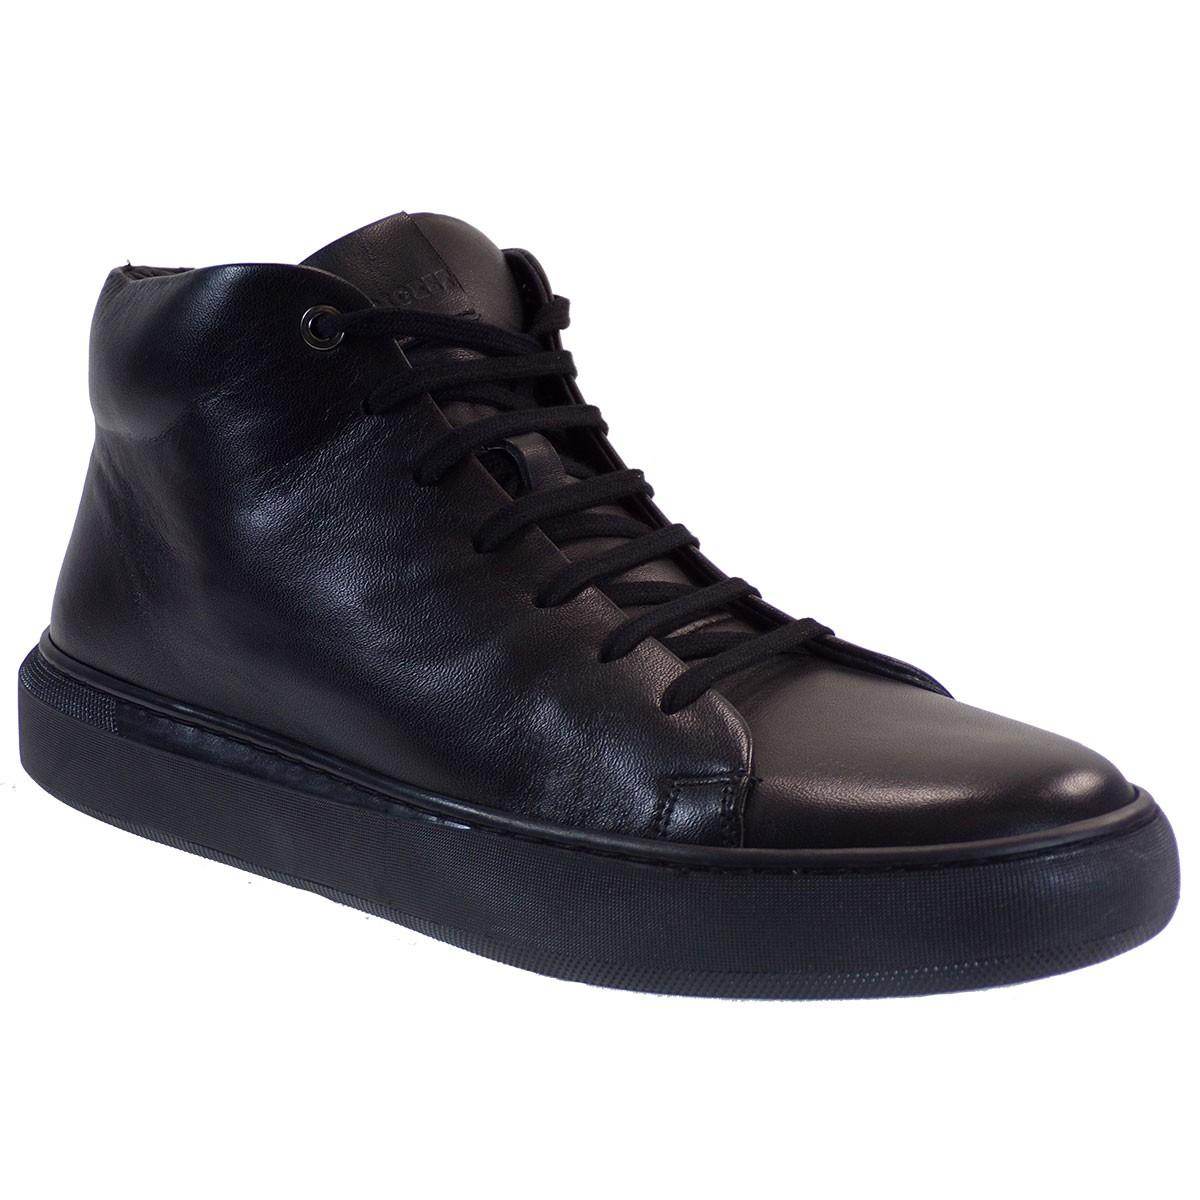 Kricket Shoes Ανδρικά Μποτάκια 4421 Μαύρο Δέρμα